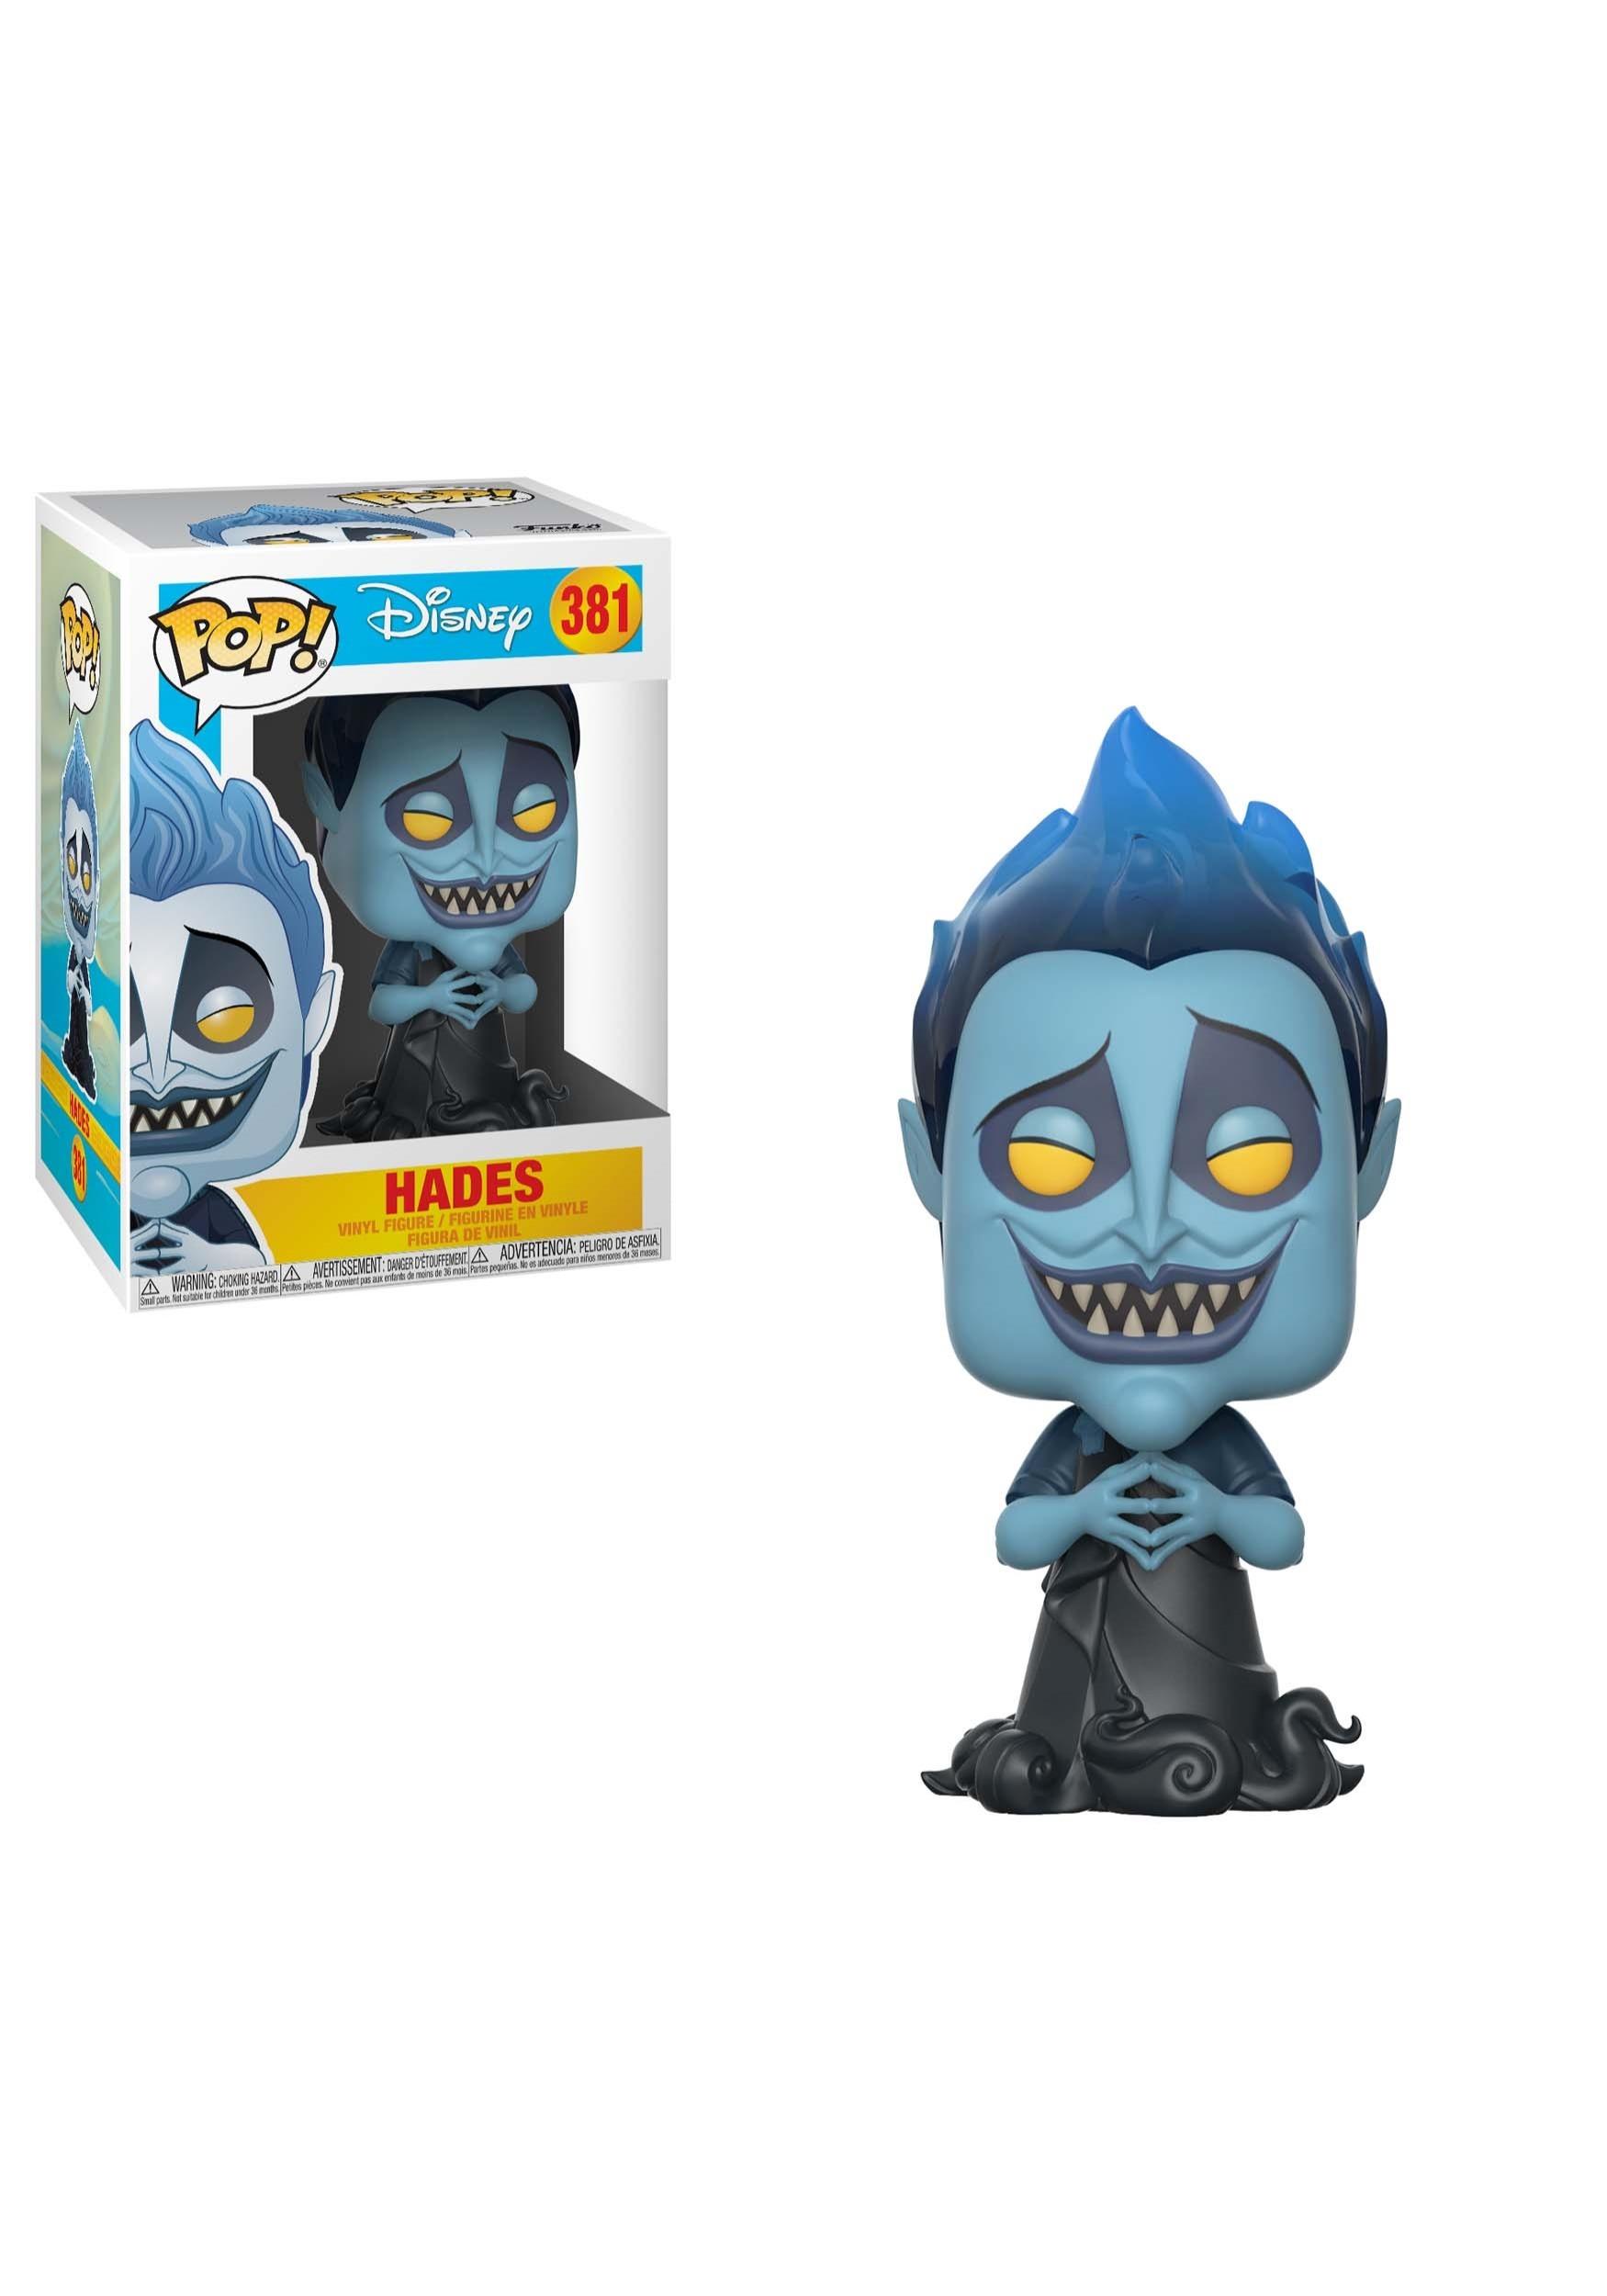 Pop Disney Hades Vinyl Figure Hercules